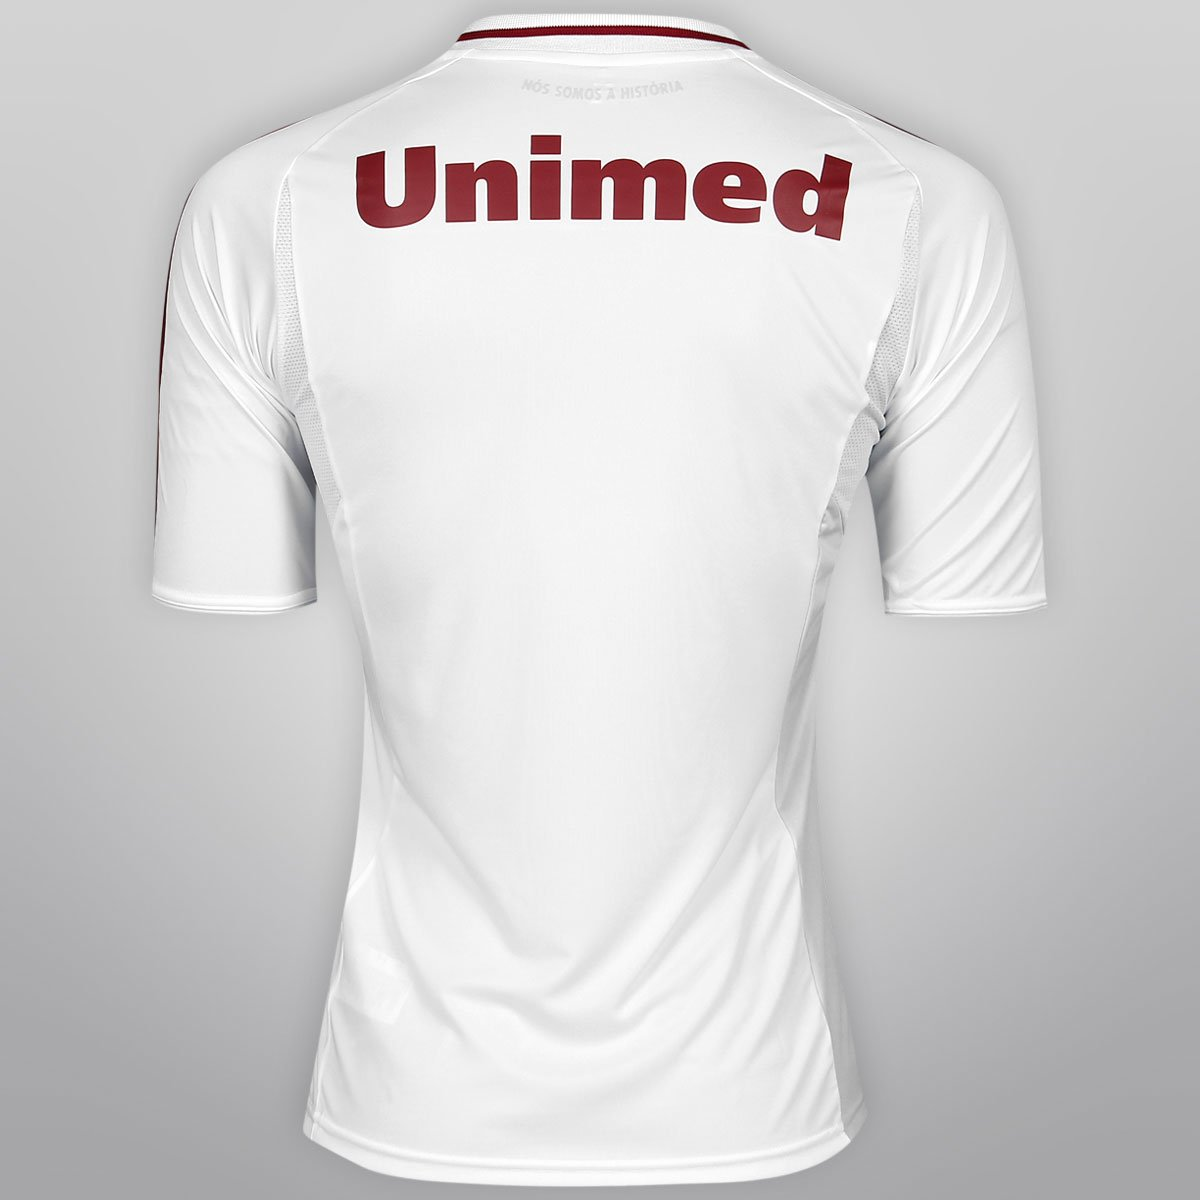 0ba5ed9a1d ... Camisa Adidas Fluminense 12 13 s nº - 110 Anos - Ed. Limitada ...